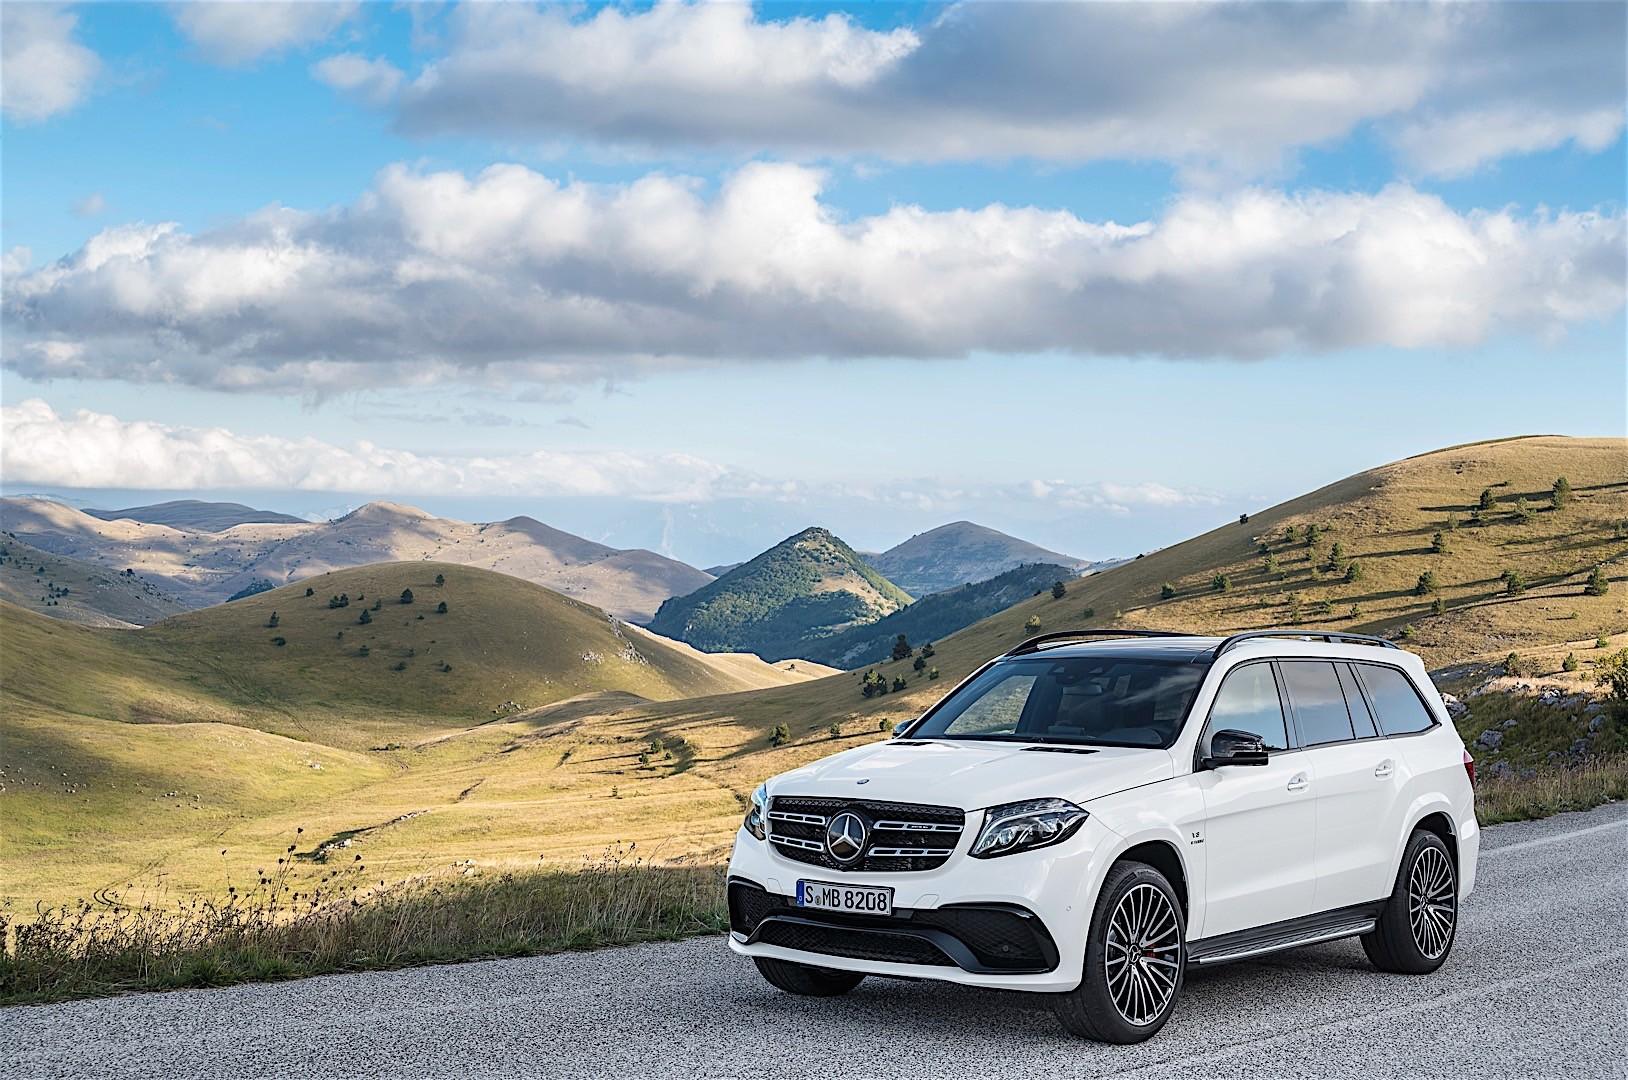 Mercedes benz gls 63 amg x166 2016 autoevolution for Mercedes benz gs